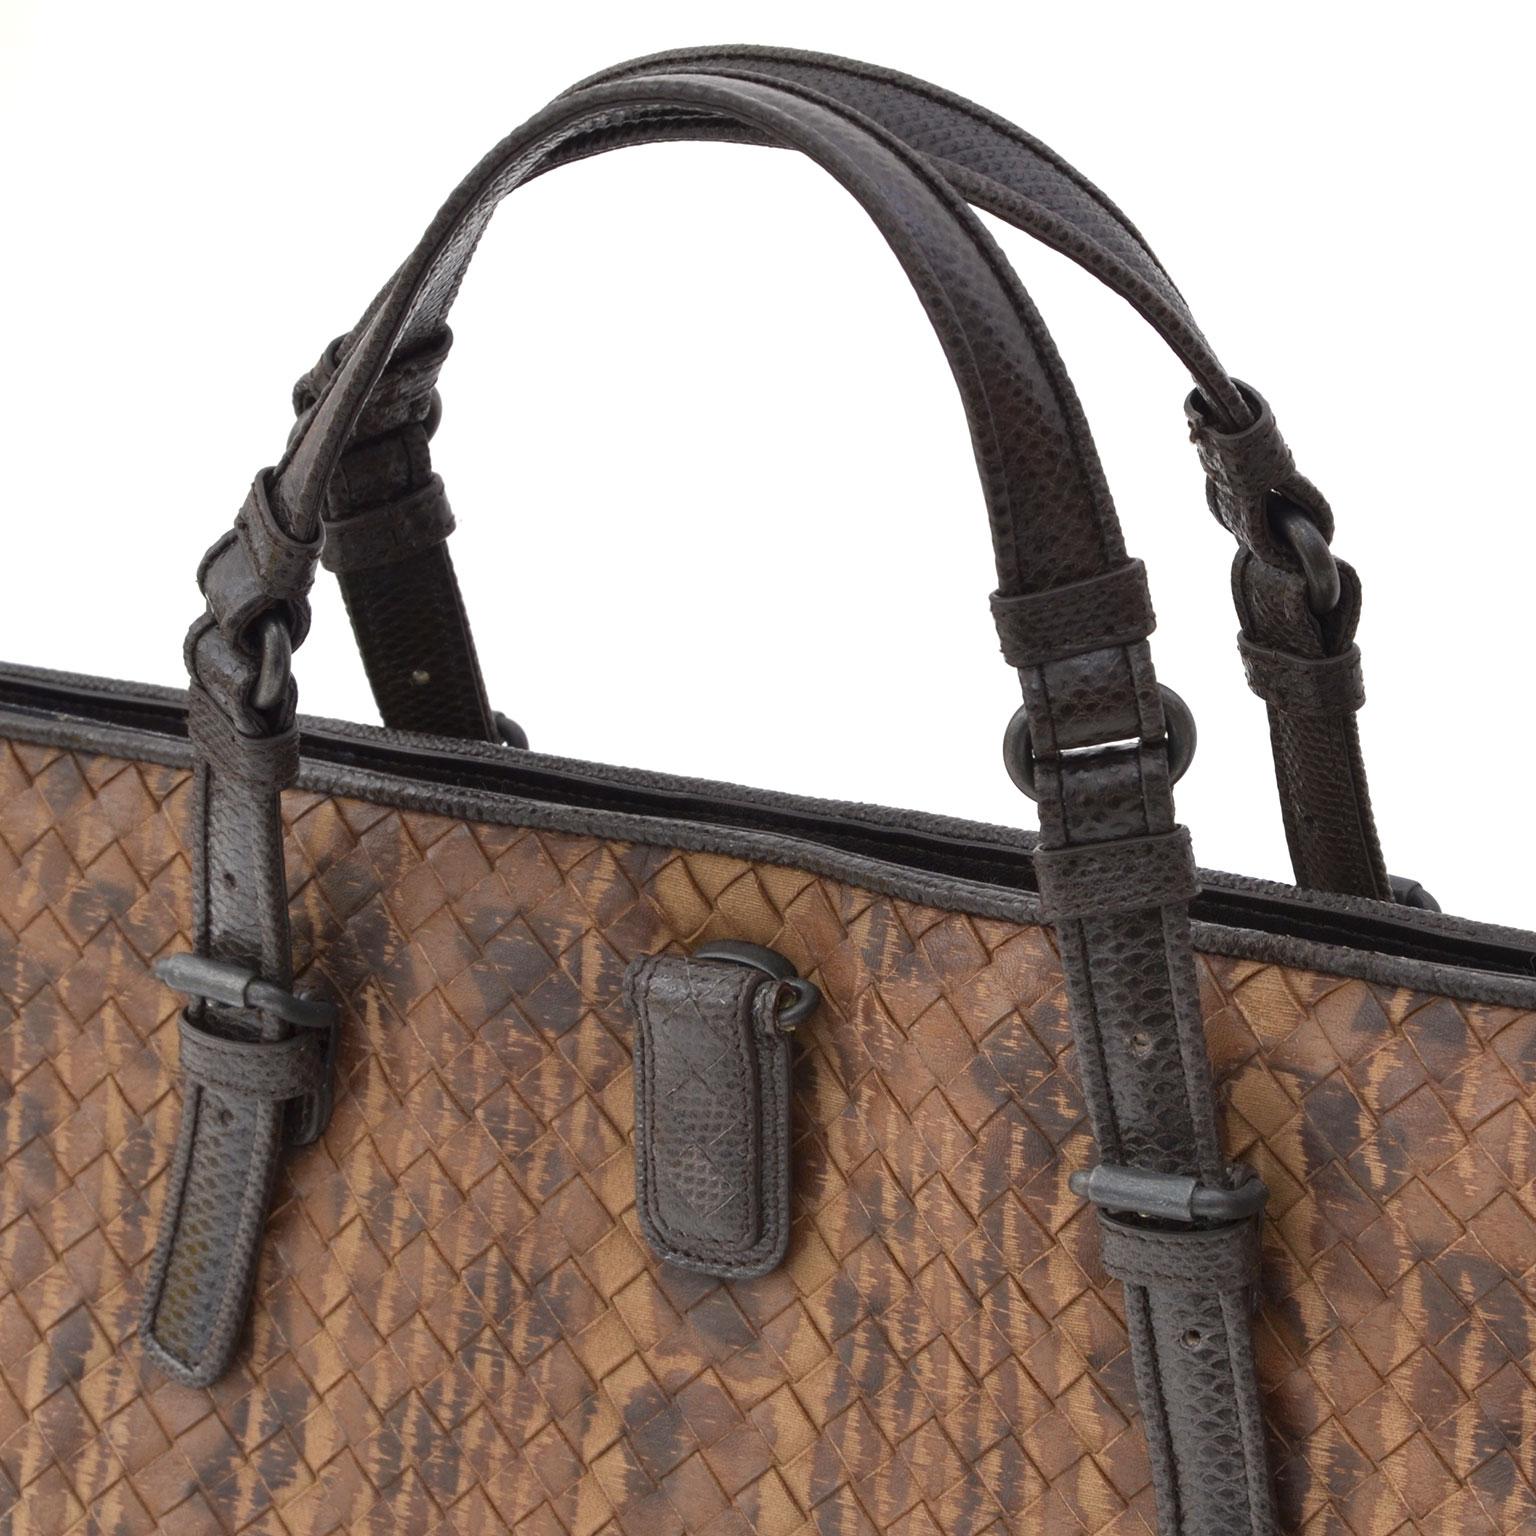 cc83e51ed5d8 Bottega Veneta Woven Doctors Purse Brown. Koop authentieke vintage designer  handtassen bij LabelLOV Antwerpen.